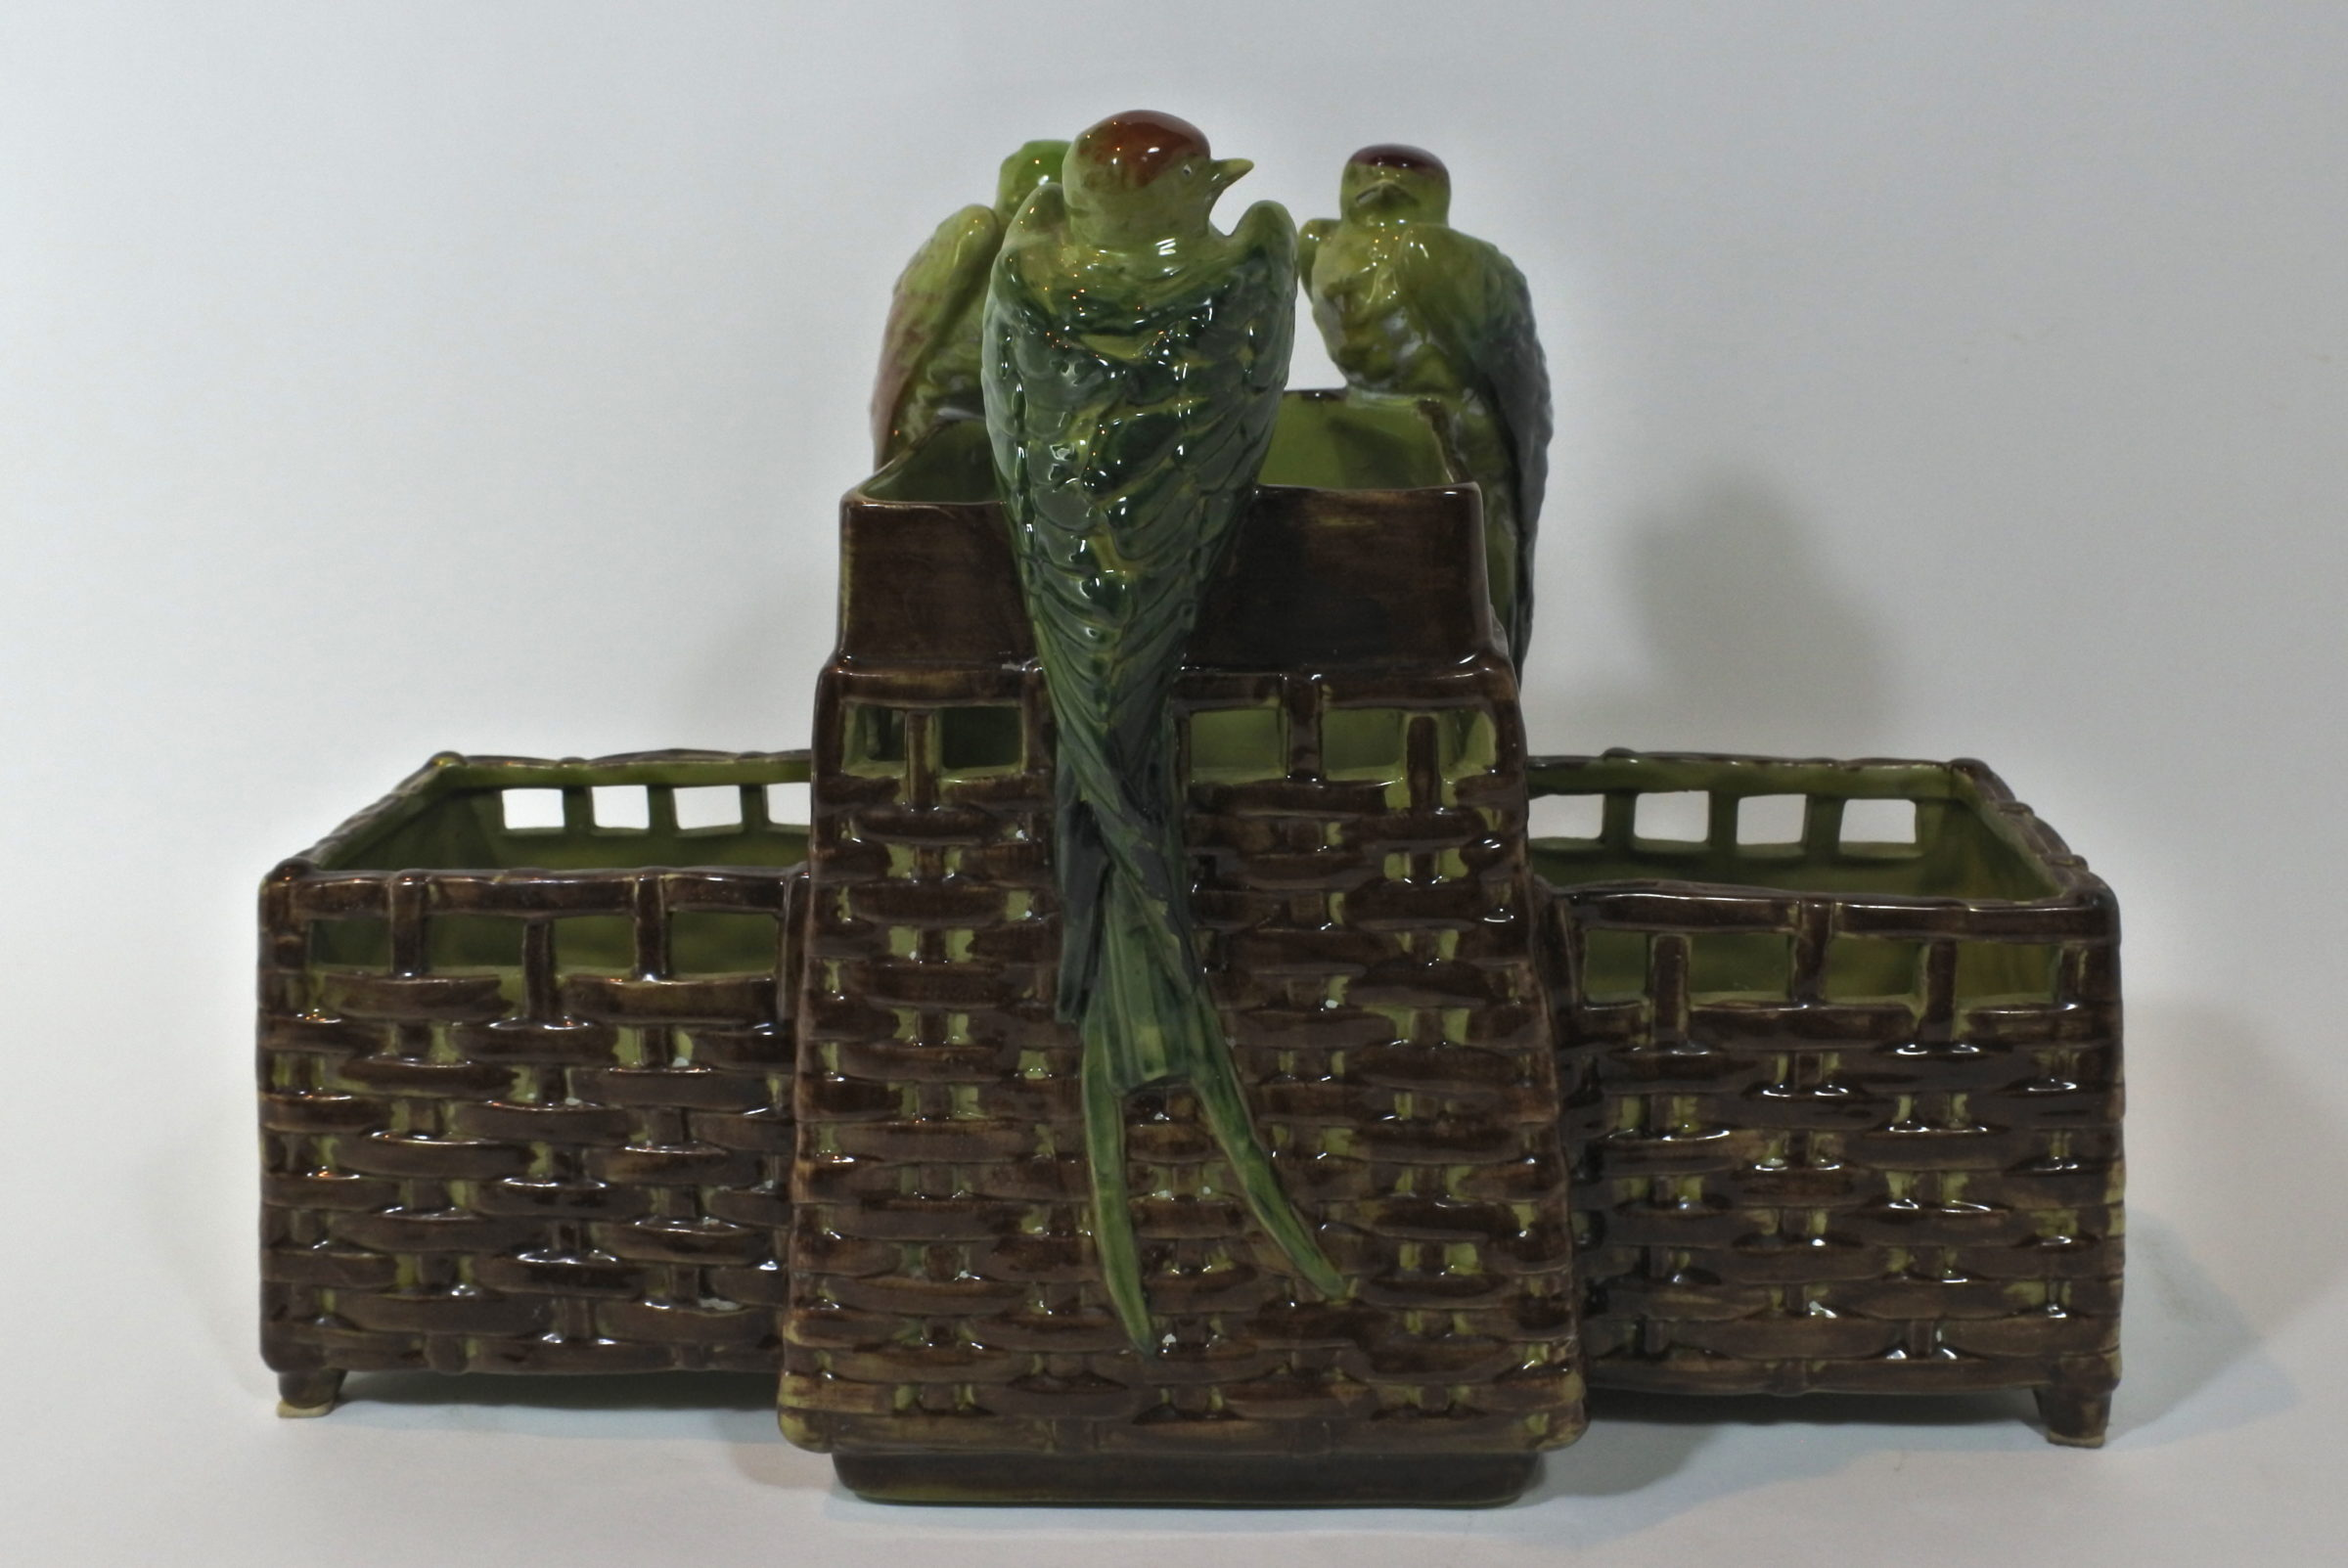 Jardinière in ceramica barbotine con uccellini - 2